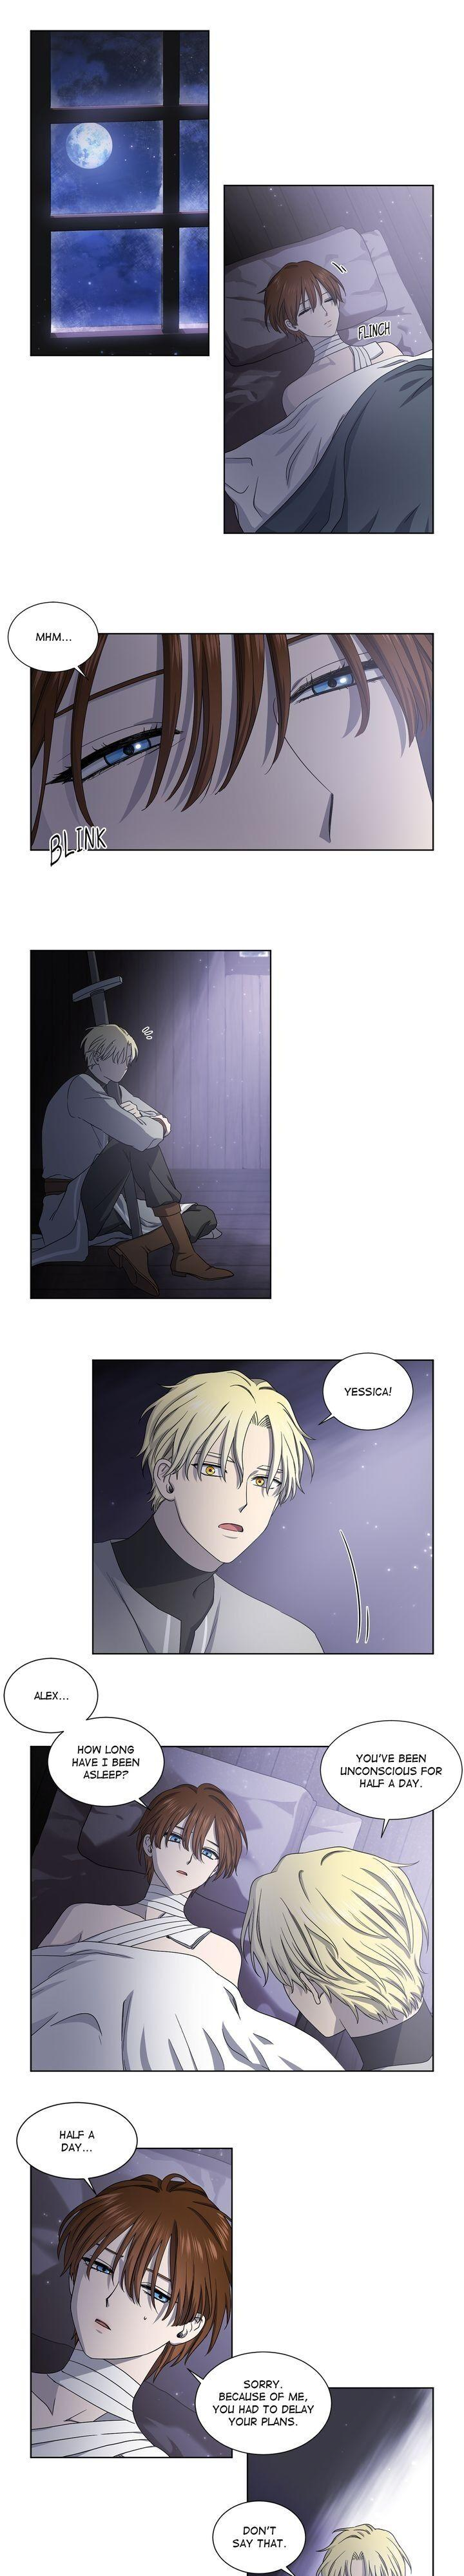 Golden Time Chapter 55 page 3 - Mangakakalots.com